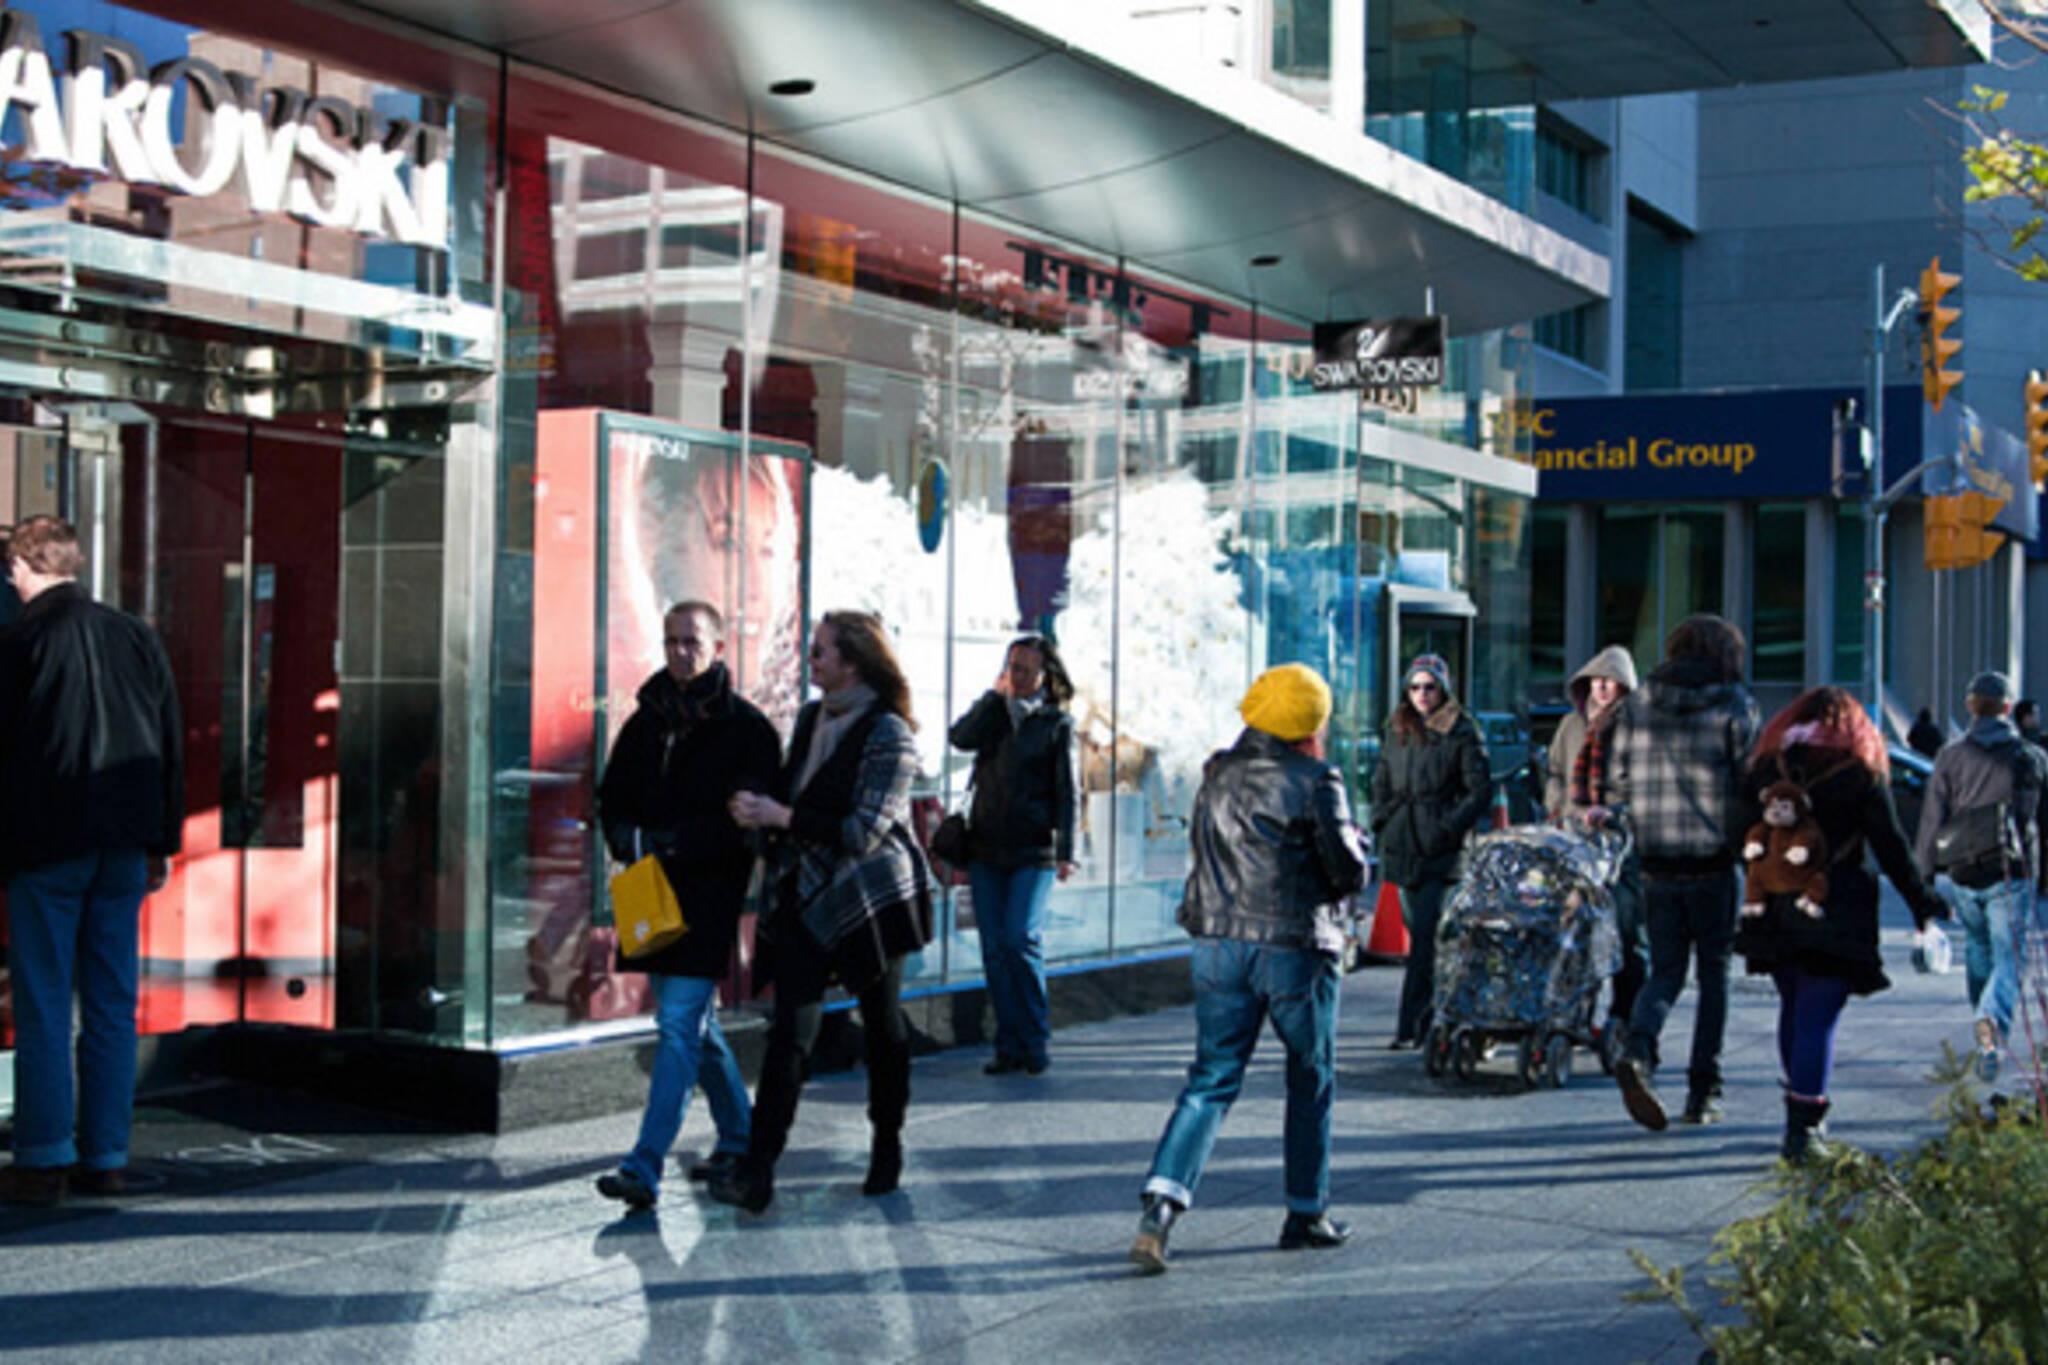 Bloor Street Shopping Toronto